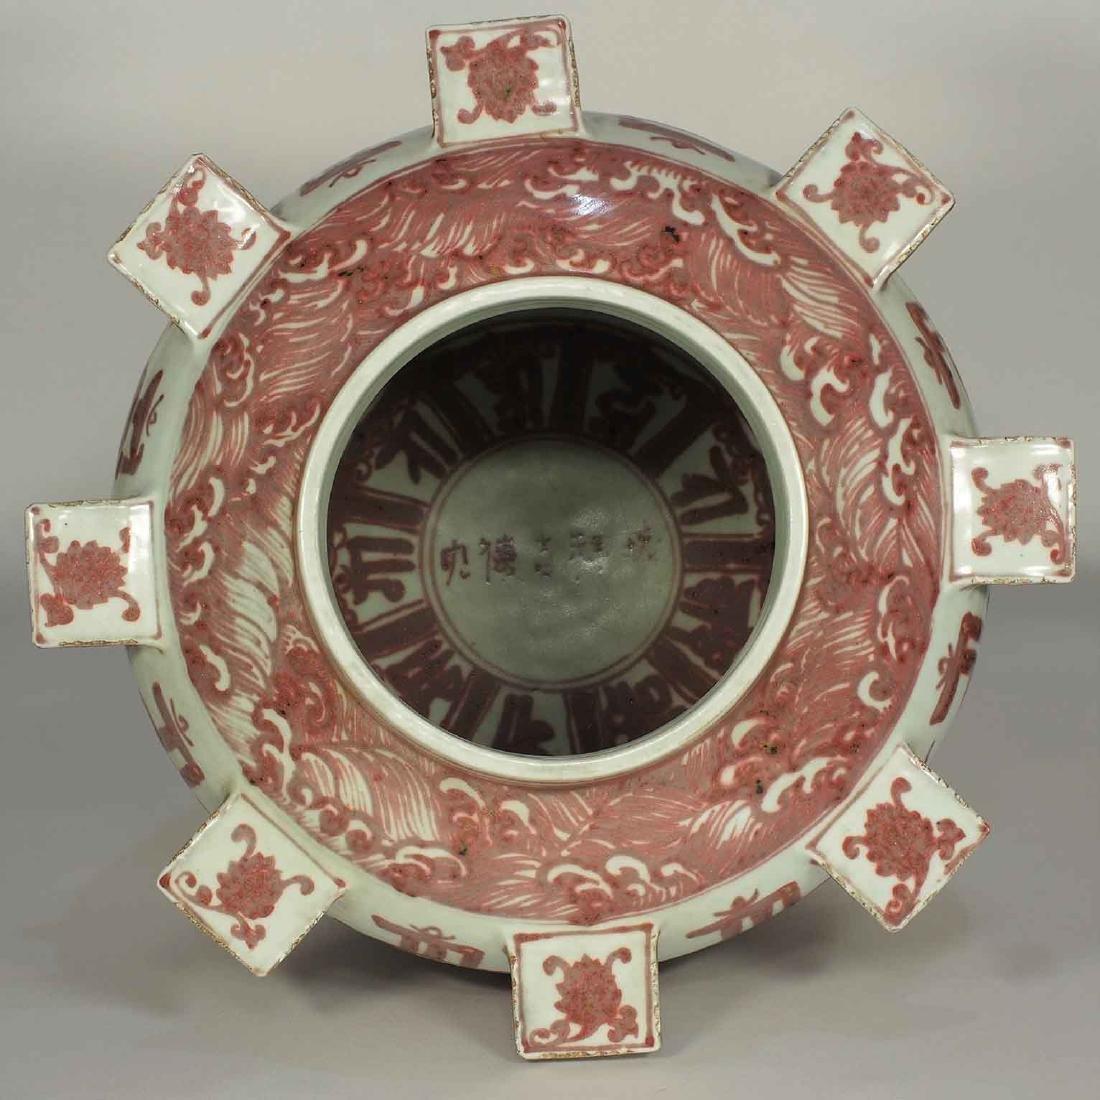 Lidded Jar with Tibetan Script Design, Yongle, Ming - 8